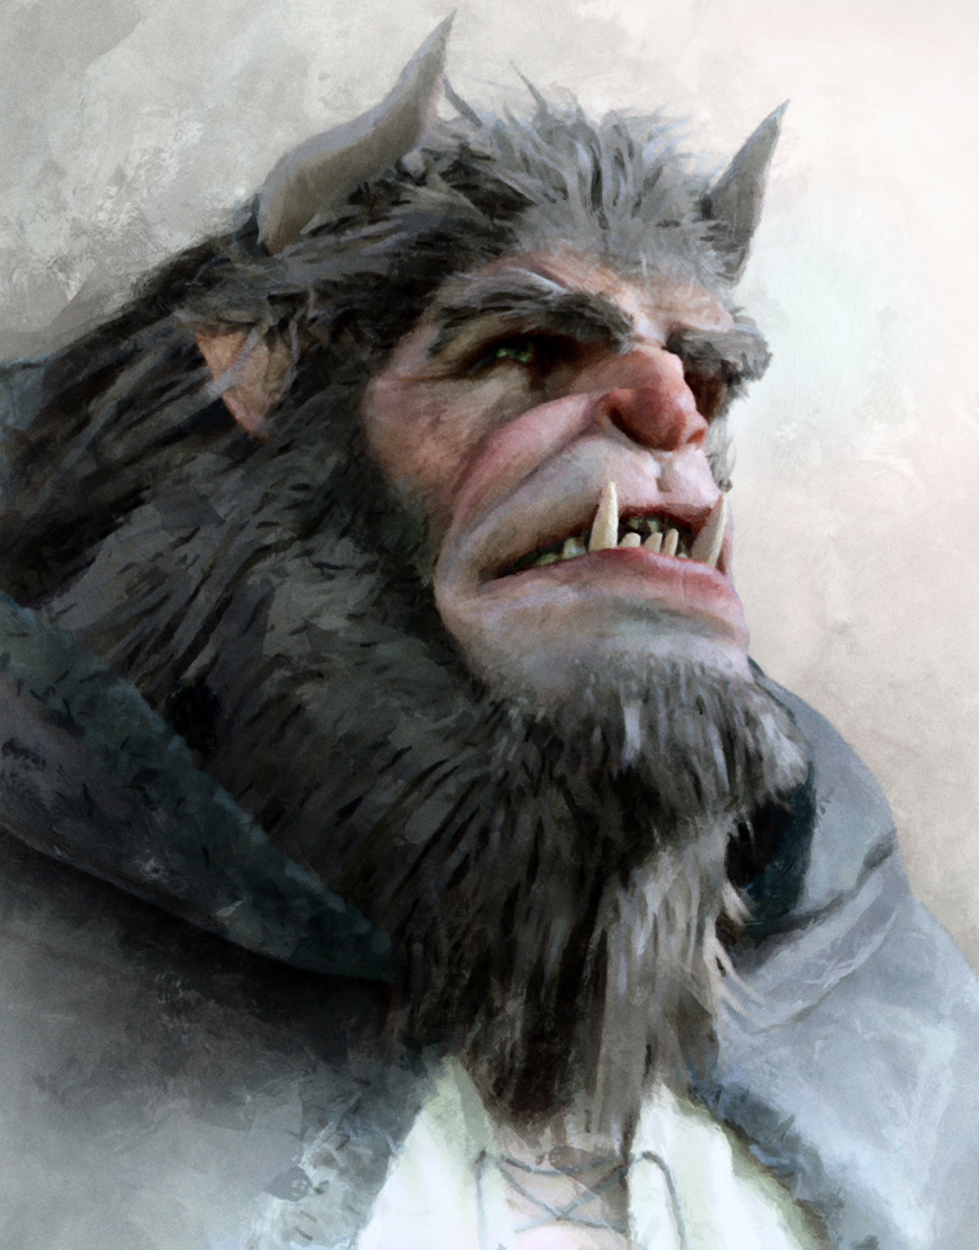 The Beast Artwork by Fred Jordan